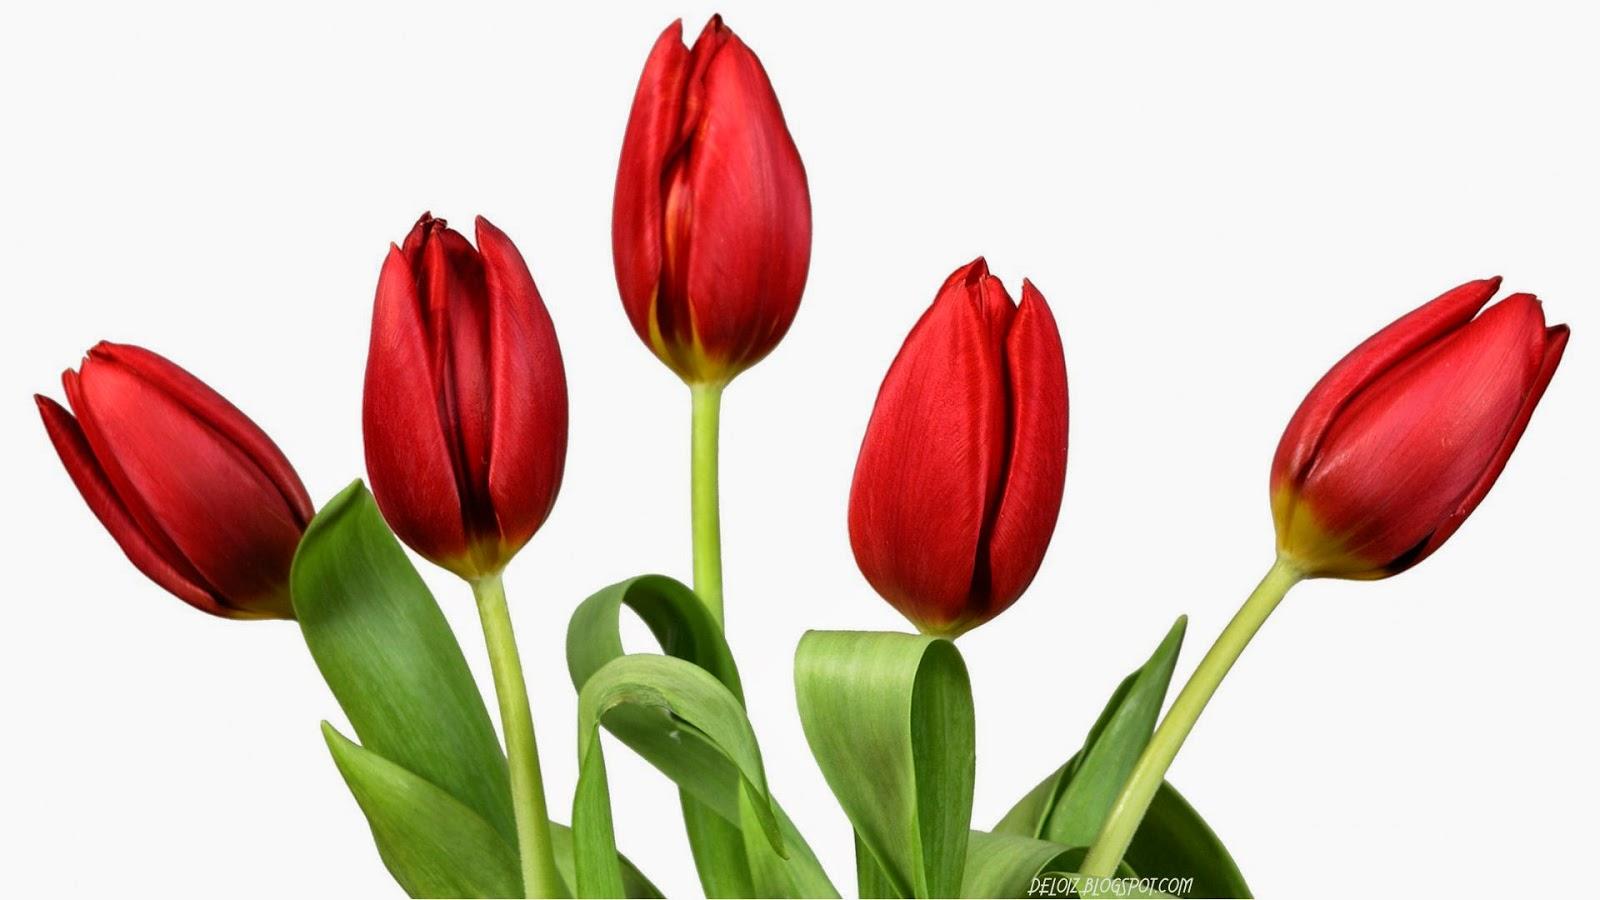 pin lukisan bunga red tulip images genuardis portal on